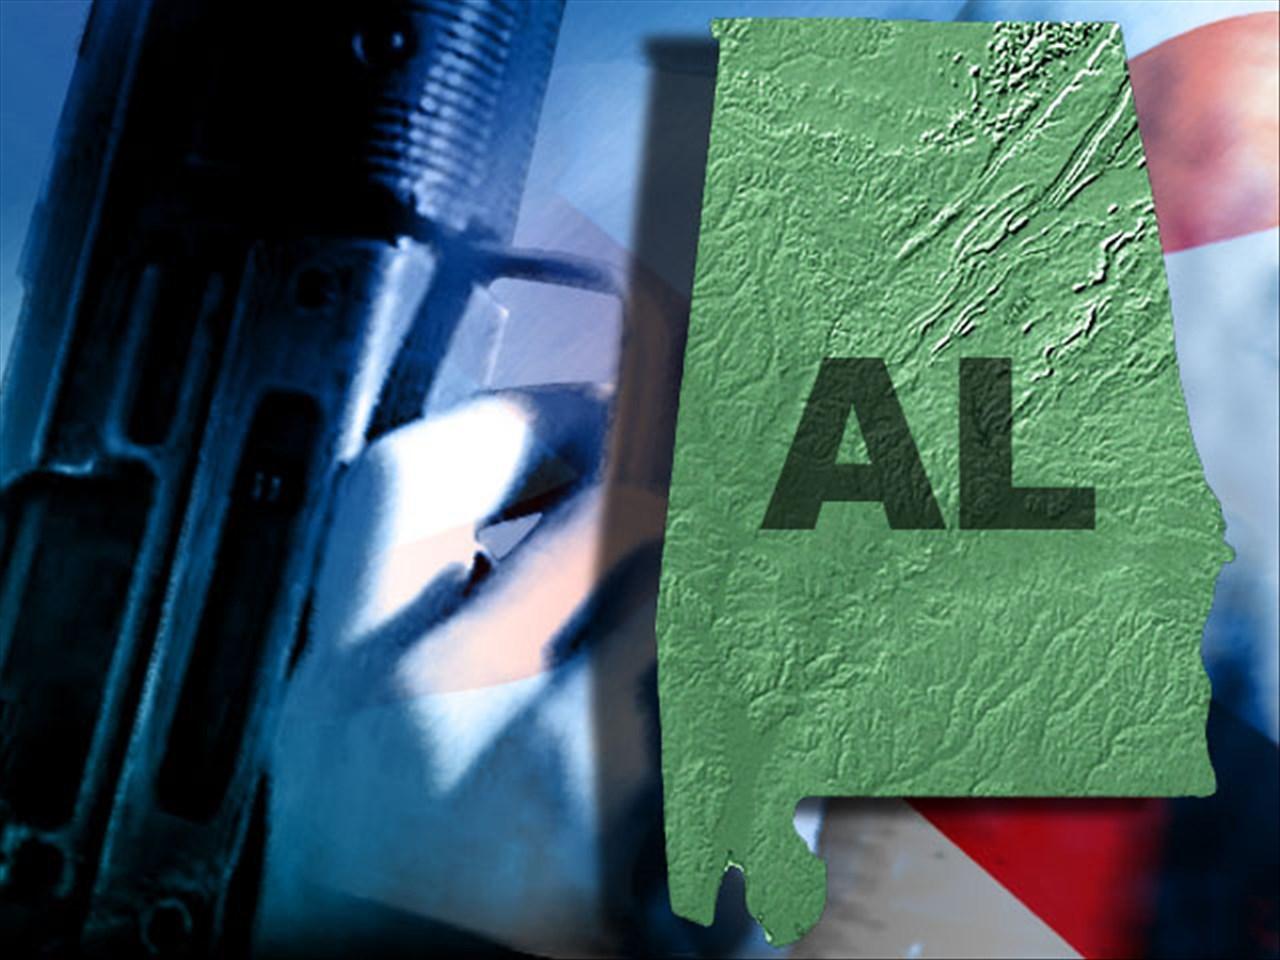 Gun surrender, permit bills debated in Legislature